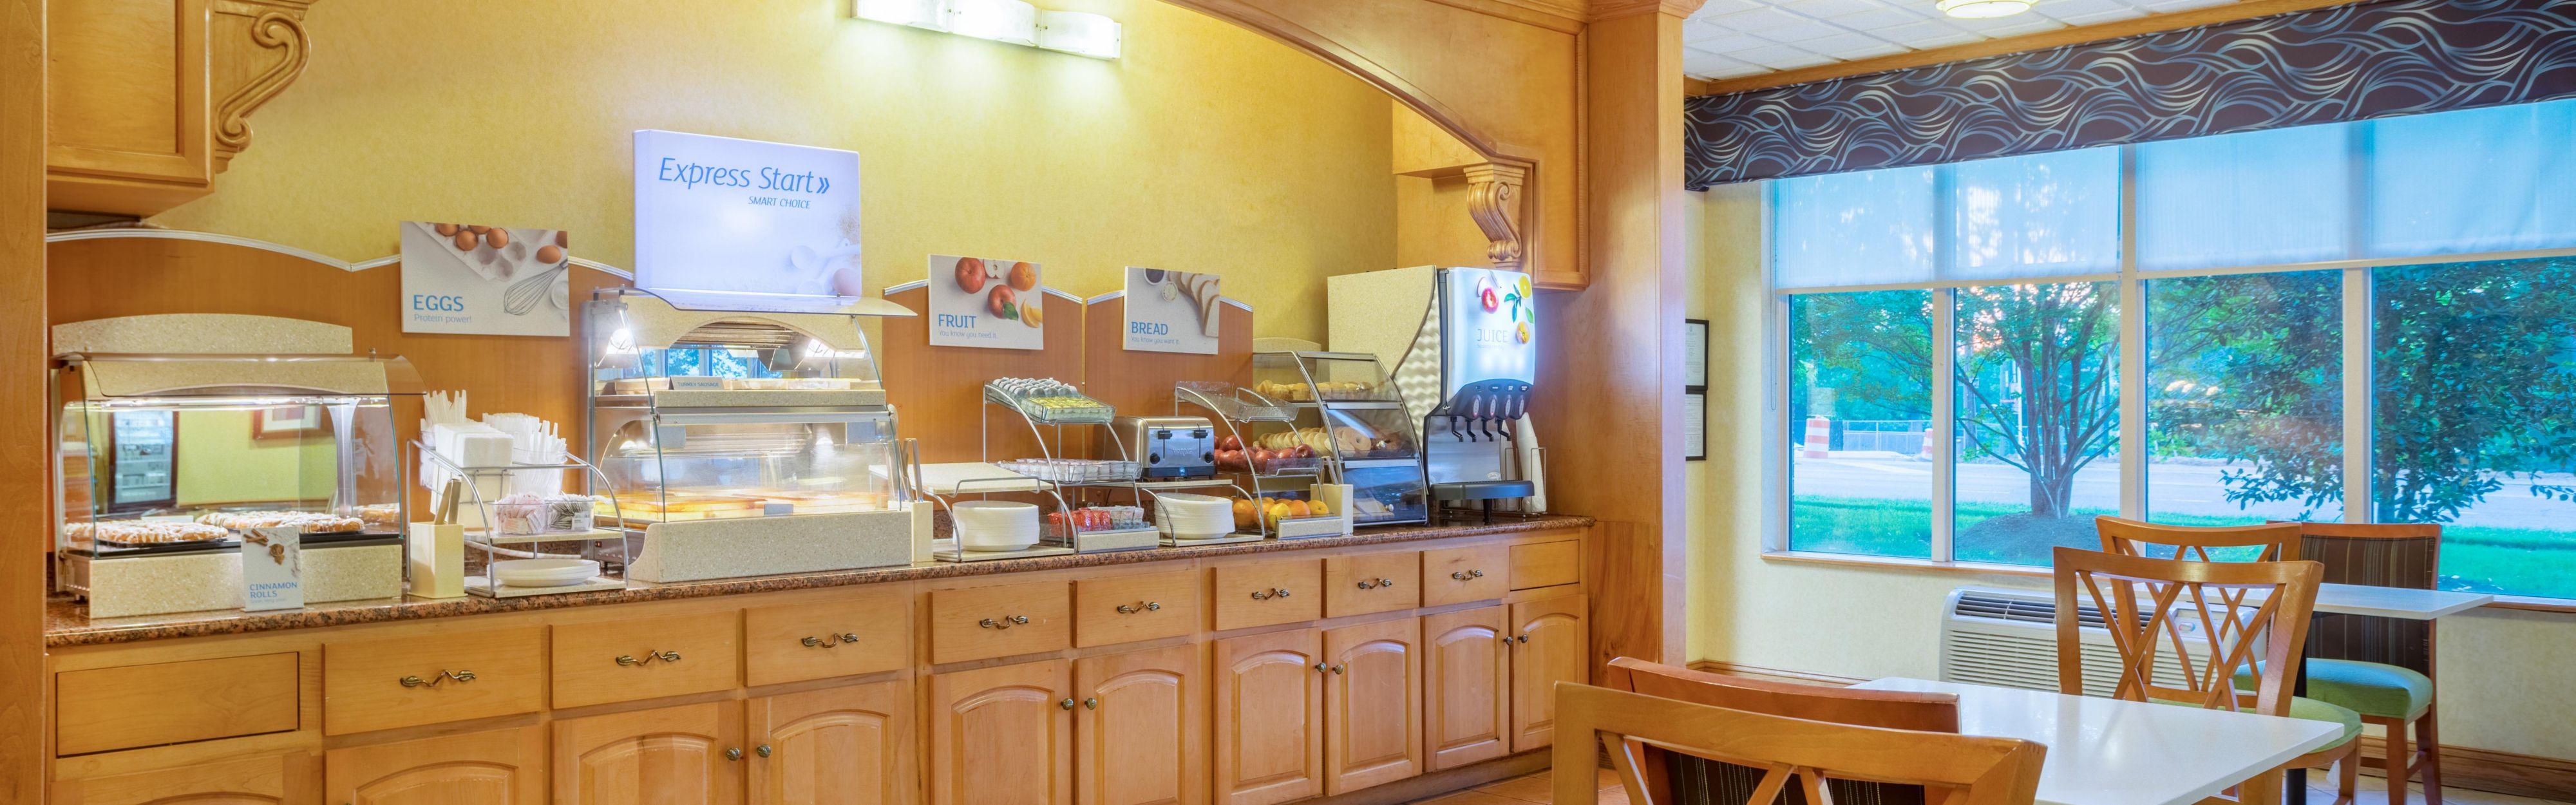 Holiday Inn Express & Suites Woodbridge image 3